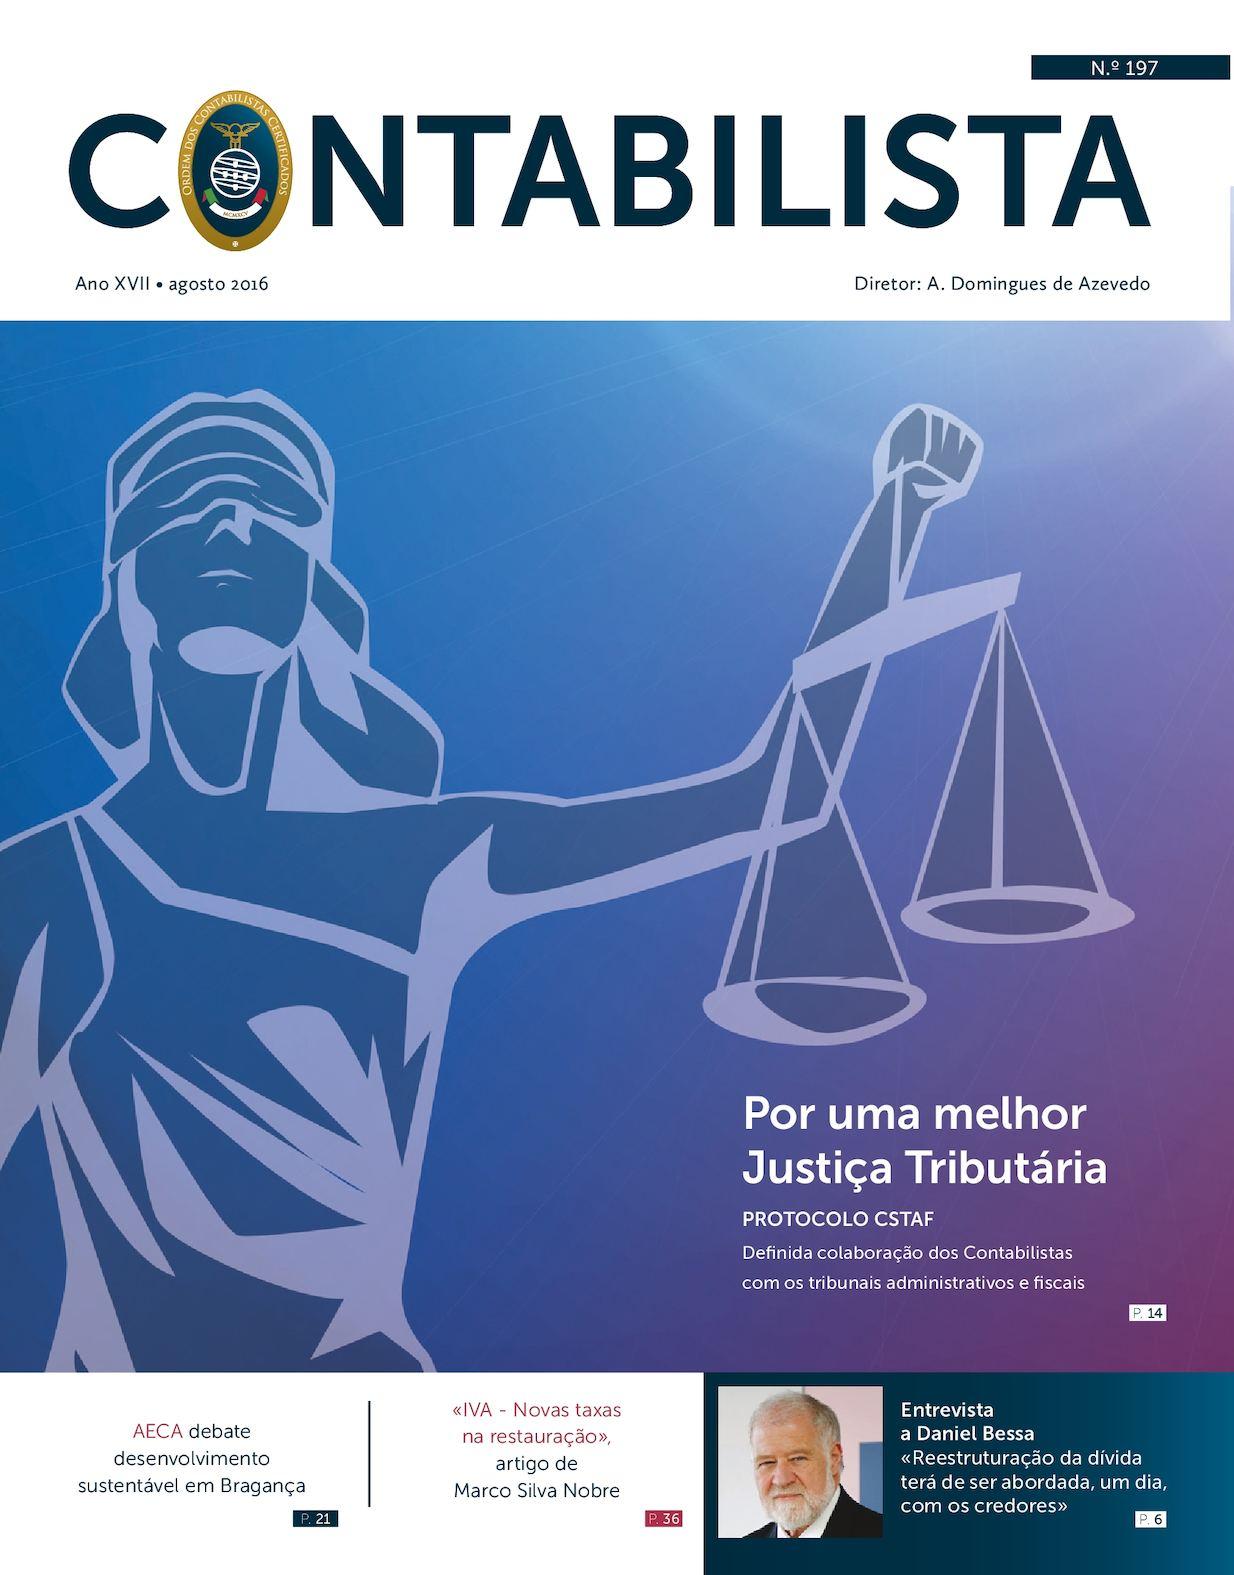 Calaméo - Revista Contabilista 197